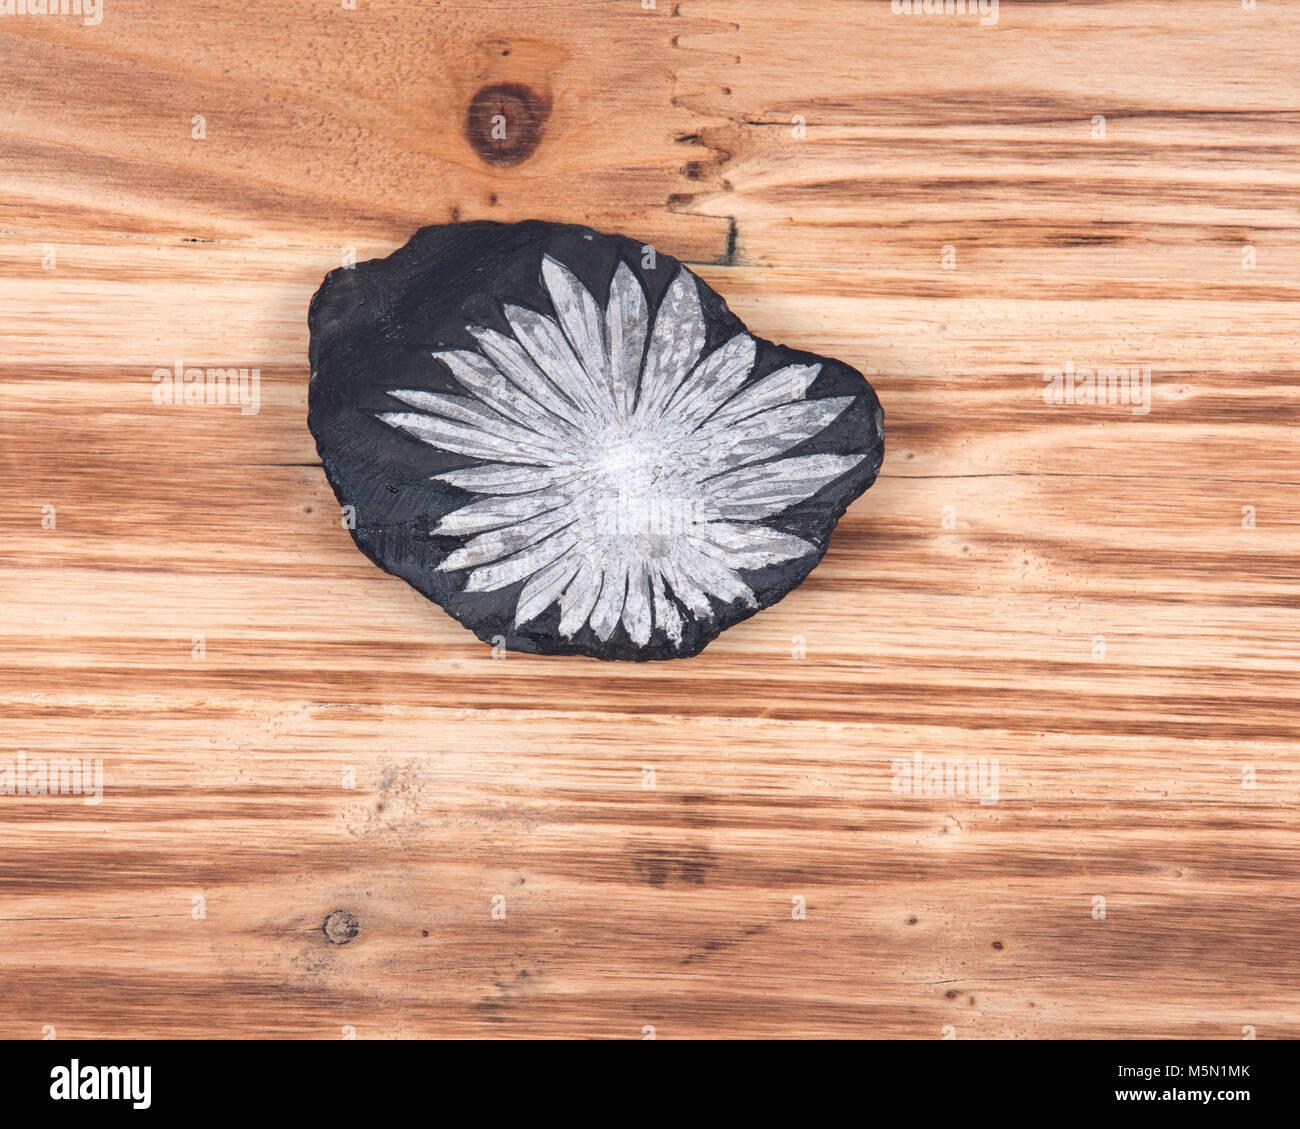 The white flower  Chrysanthemum stone on vintage wooden background - Stock Image